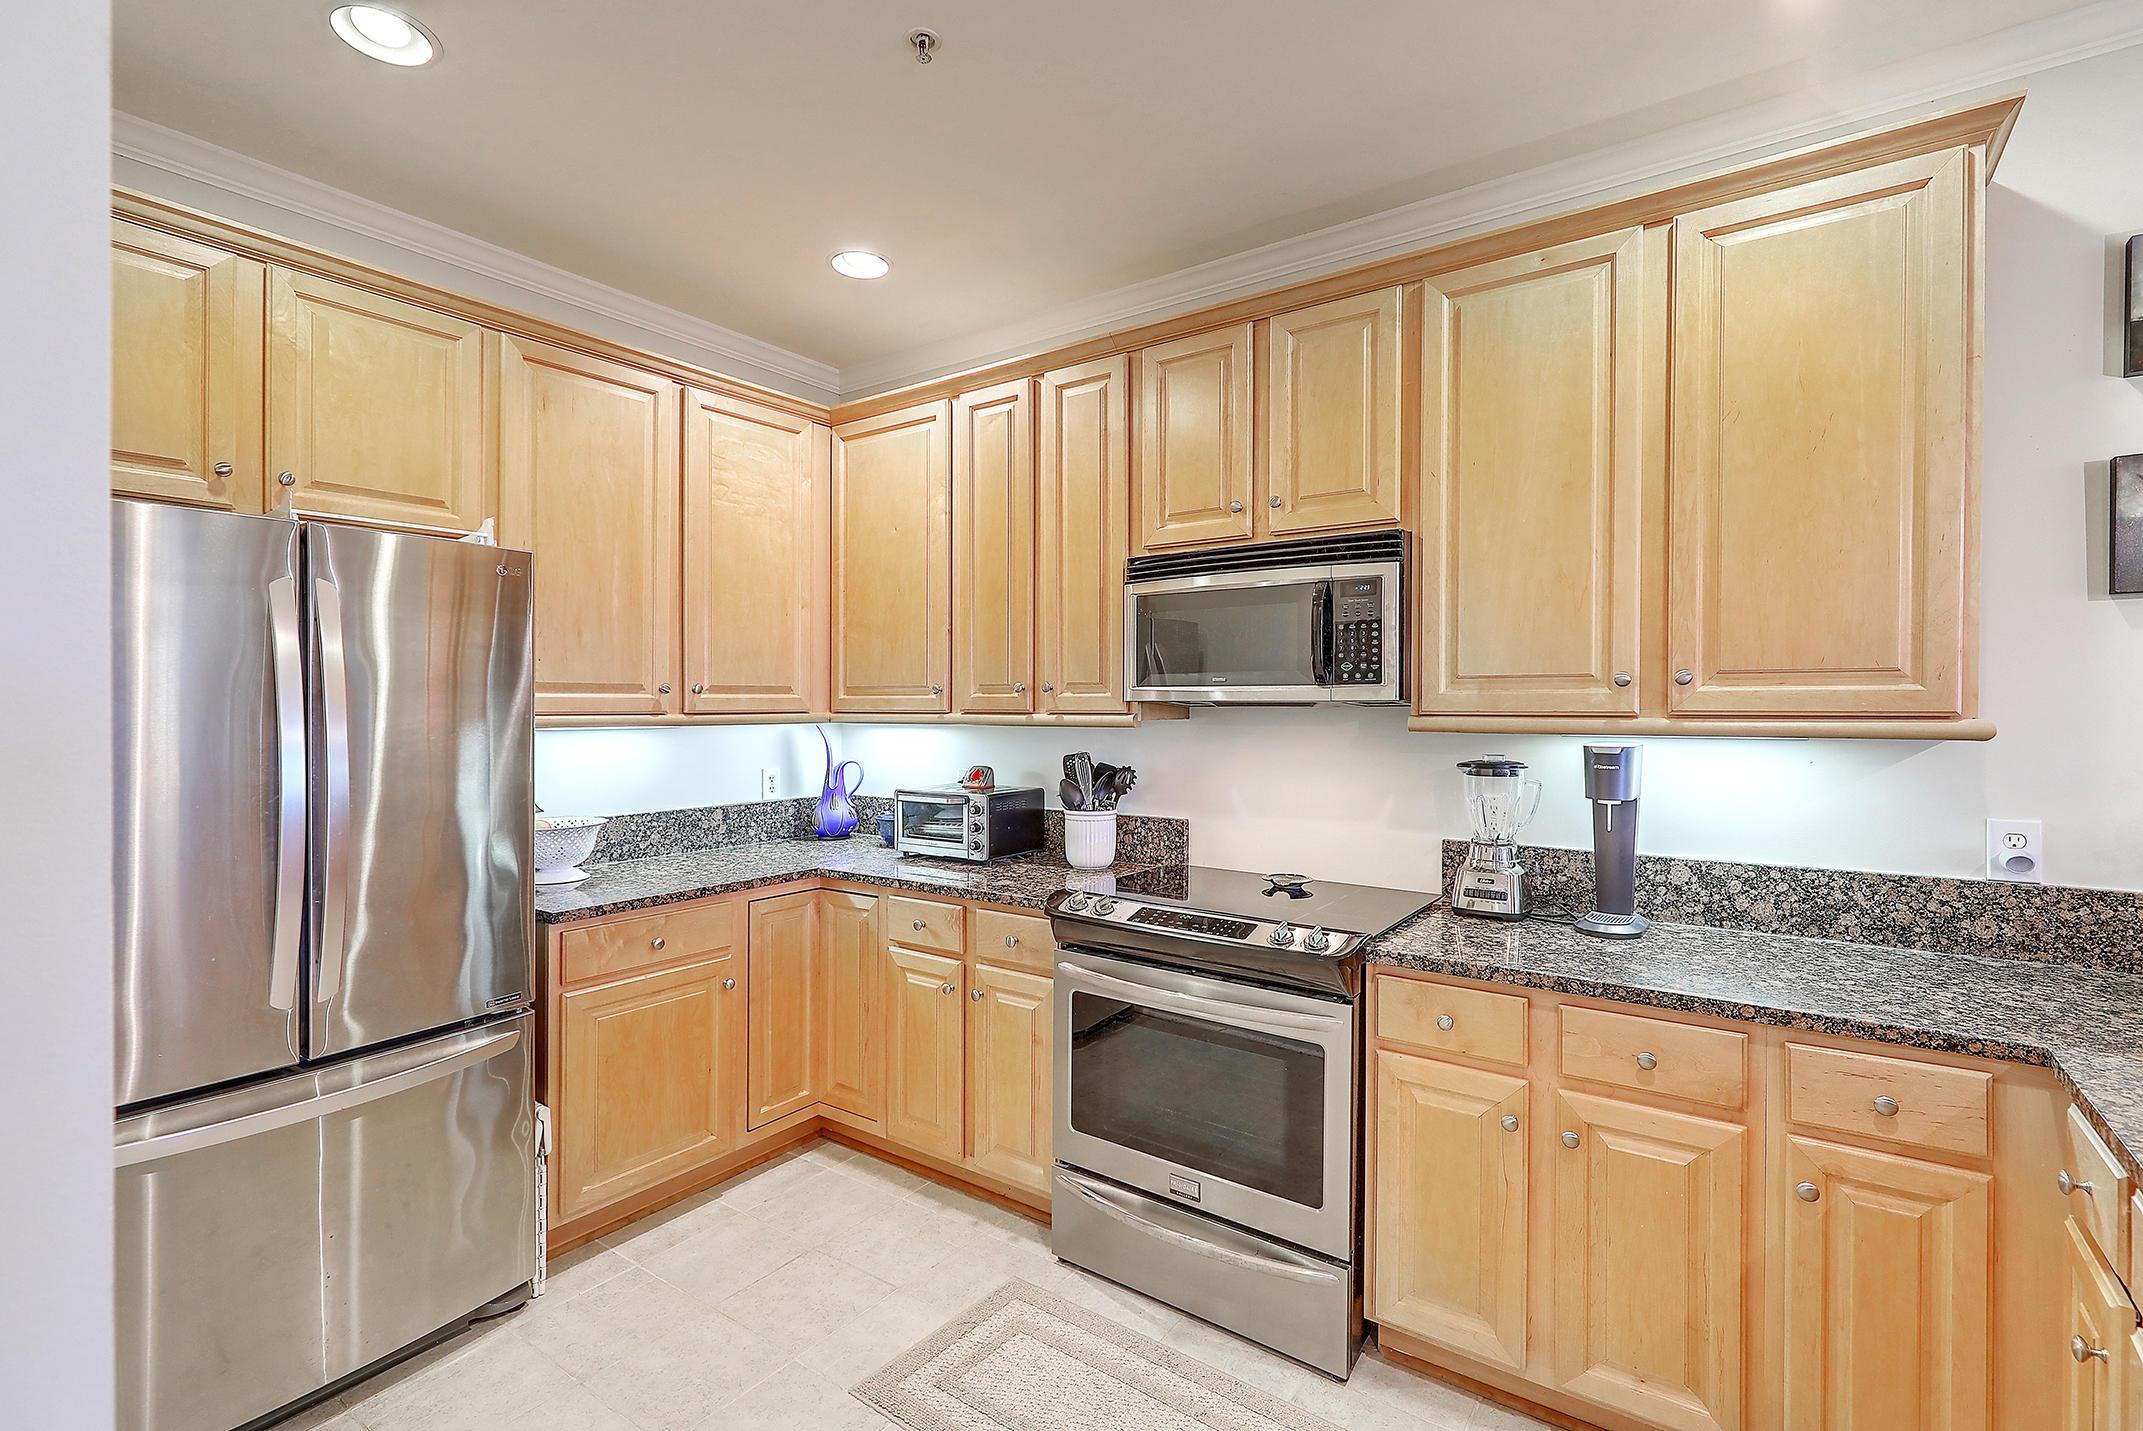 Etiwan Pointe Homes For Sale - 124 Winding Creek, Mount Pleasant, SC - 27